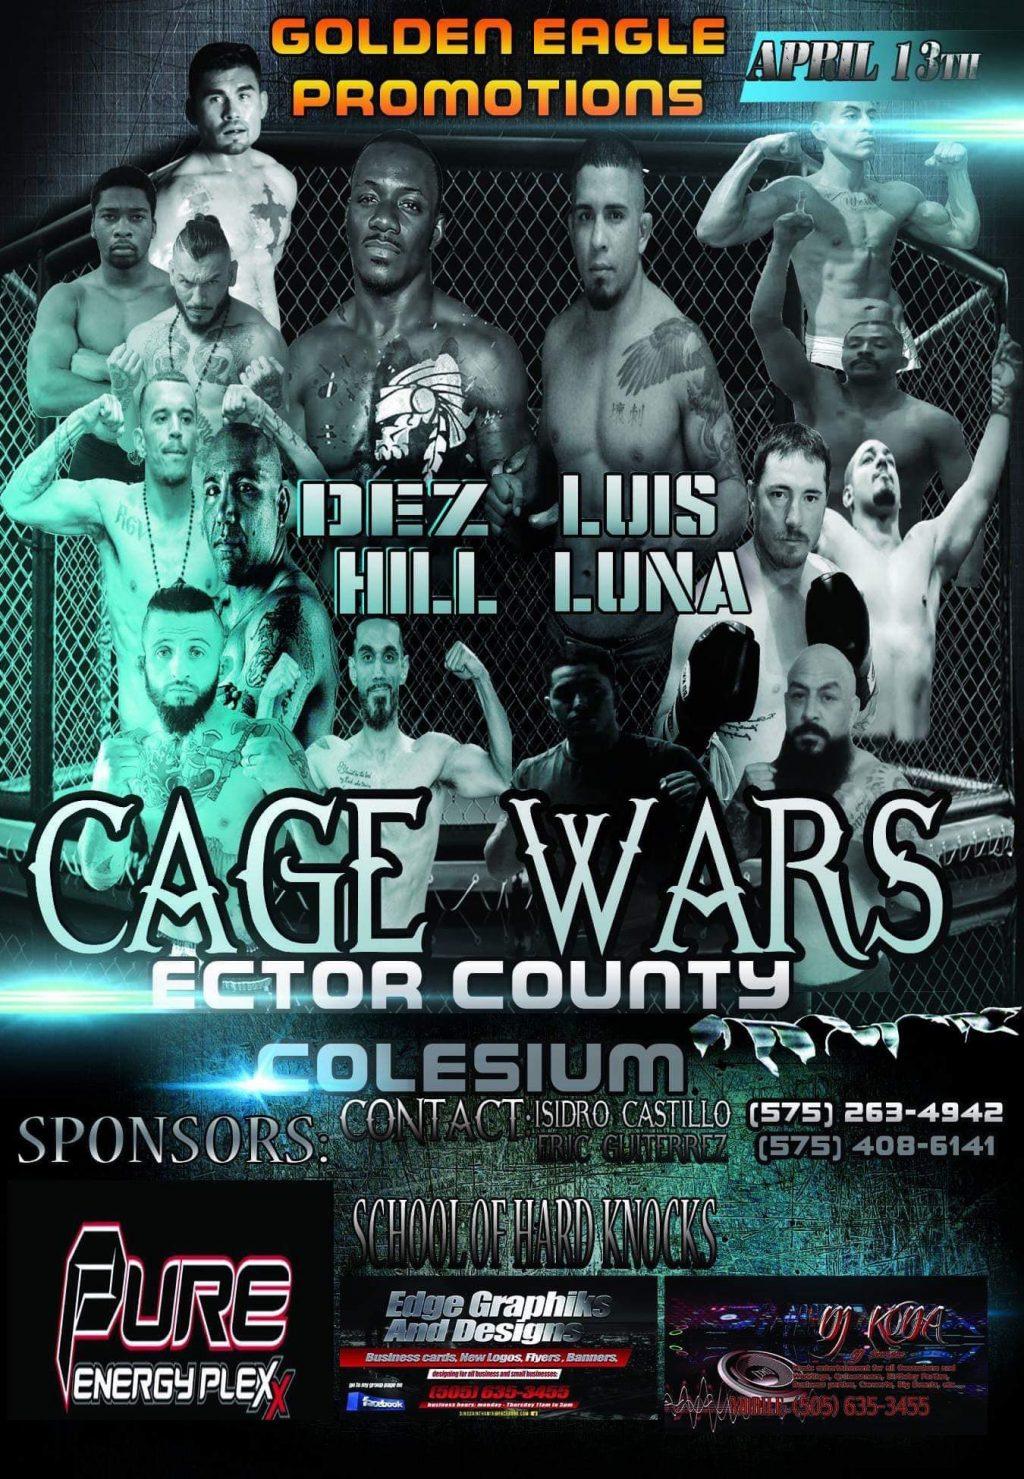 Dez Hill, Luis Luna, Cage Wars, Golden Eagle Promotions